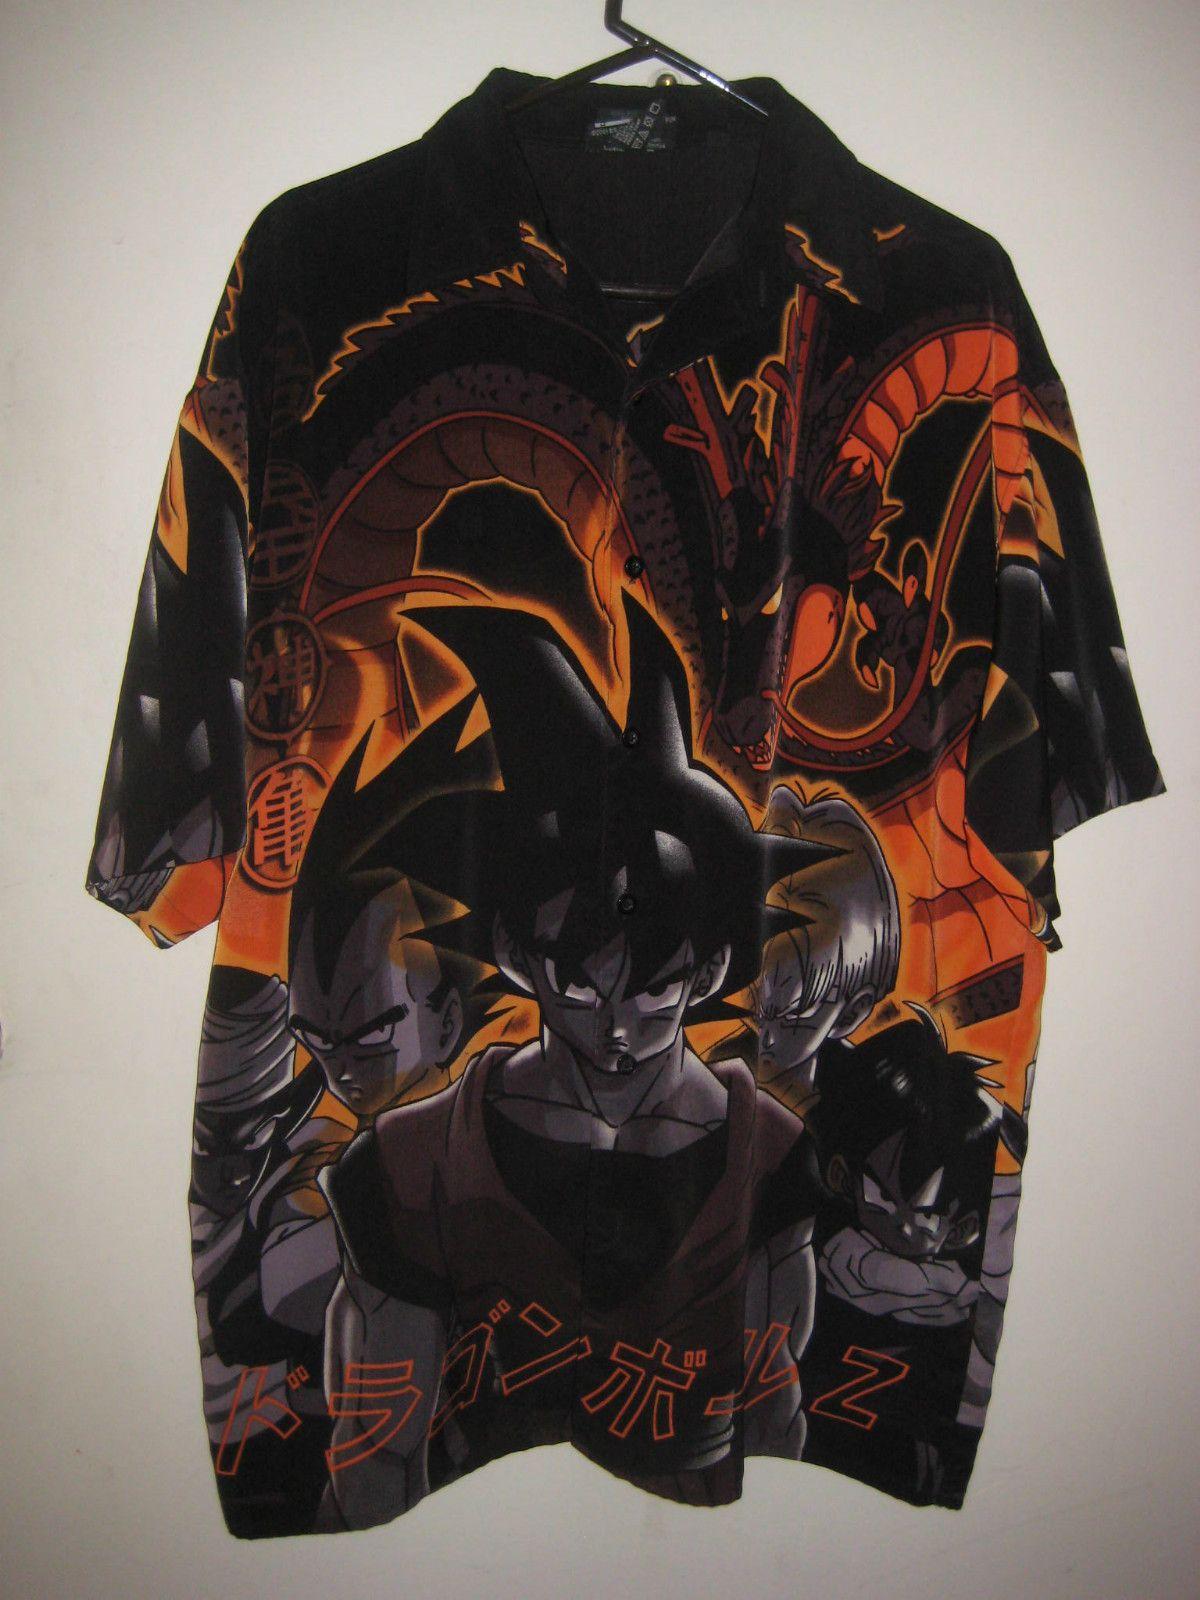 eb3f3e3e9 Mens Dragonball Z Goku Button Down Anime Camp Bowling Shirt Size ...